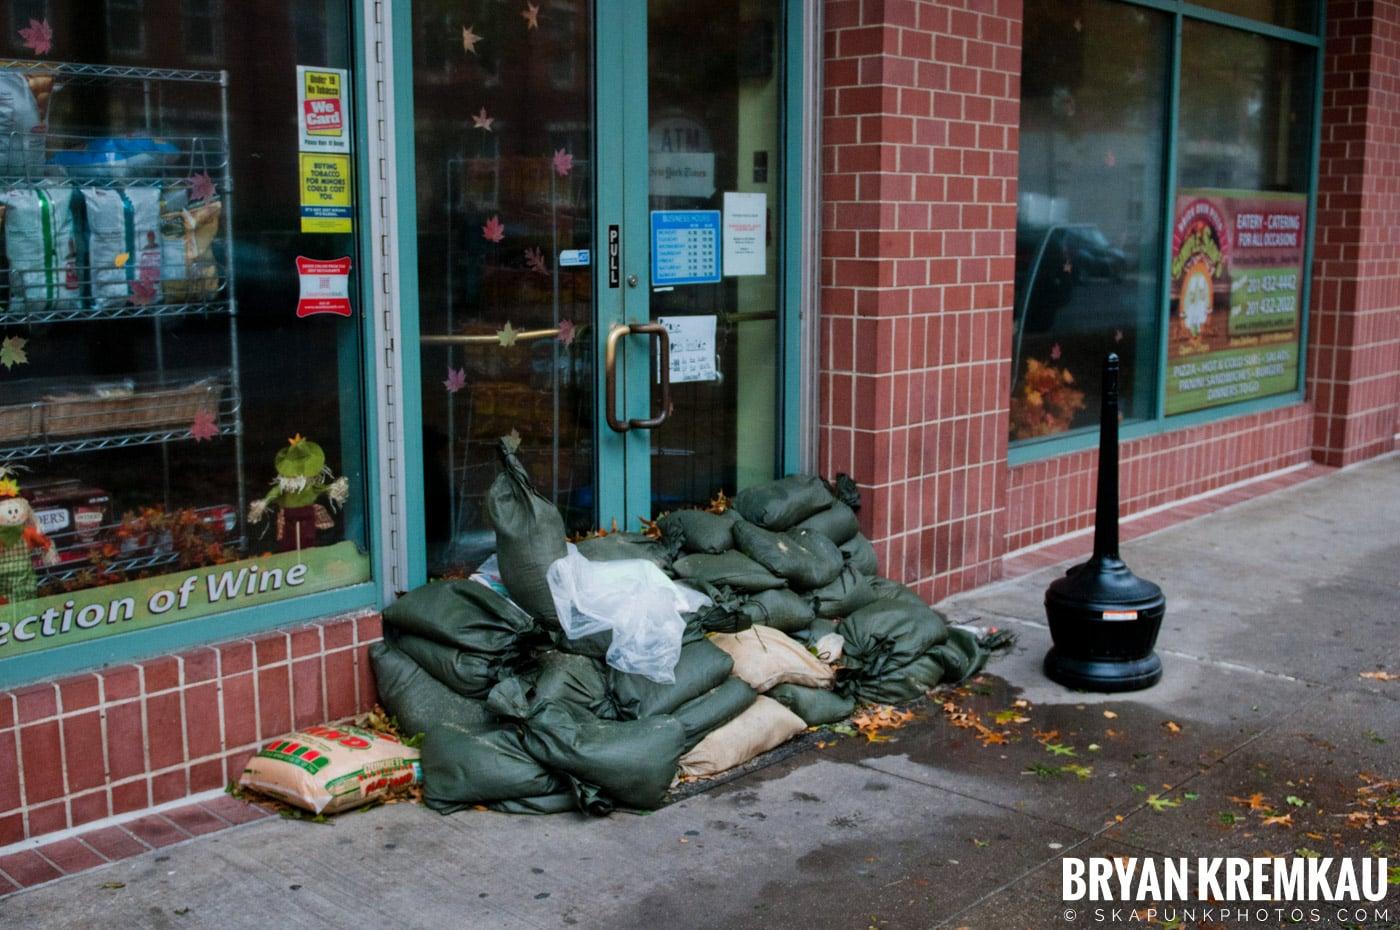 Hurricane Sandy 2012 @ Paulus Hook, Jersey City - 10.29.12 - 10.30.12 (26)